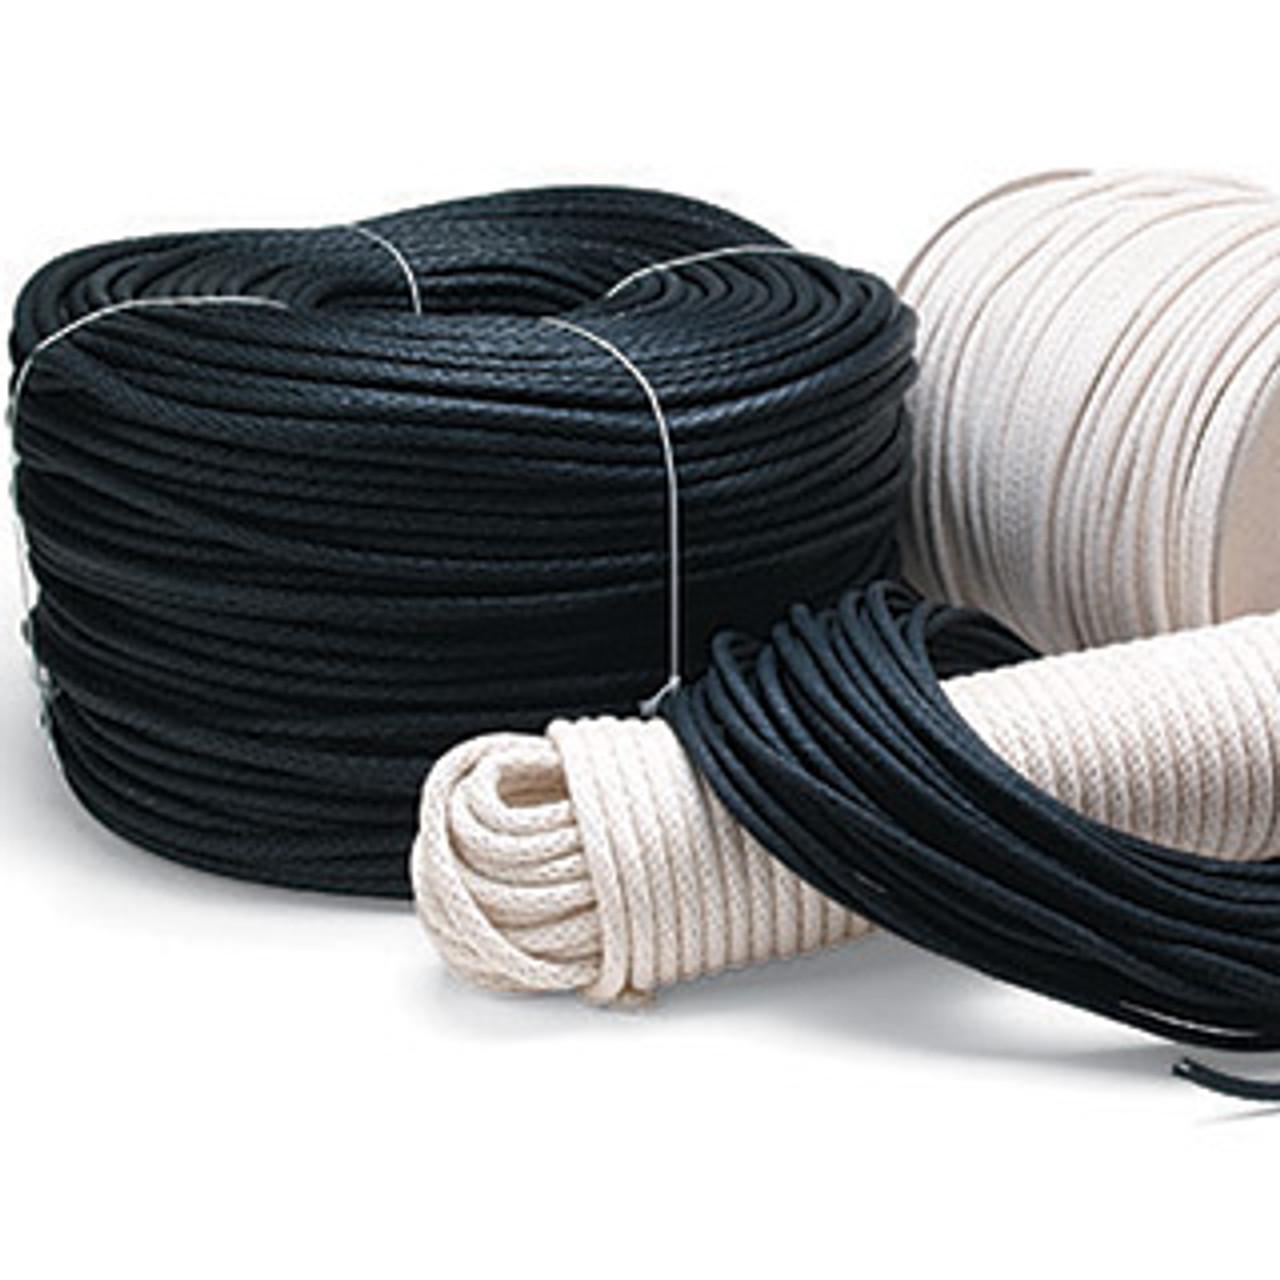 Sash Cord - Black - 100 ft. #6